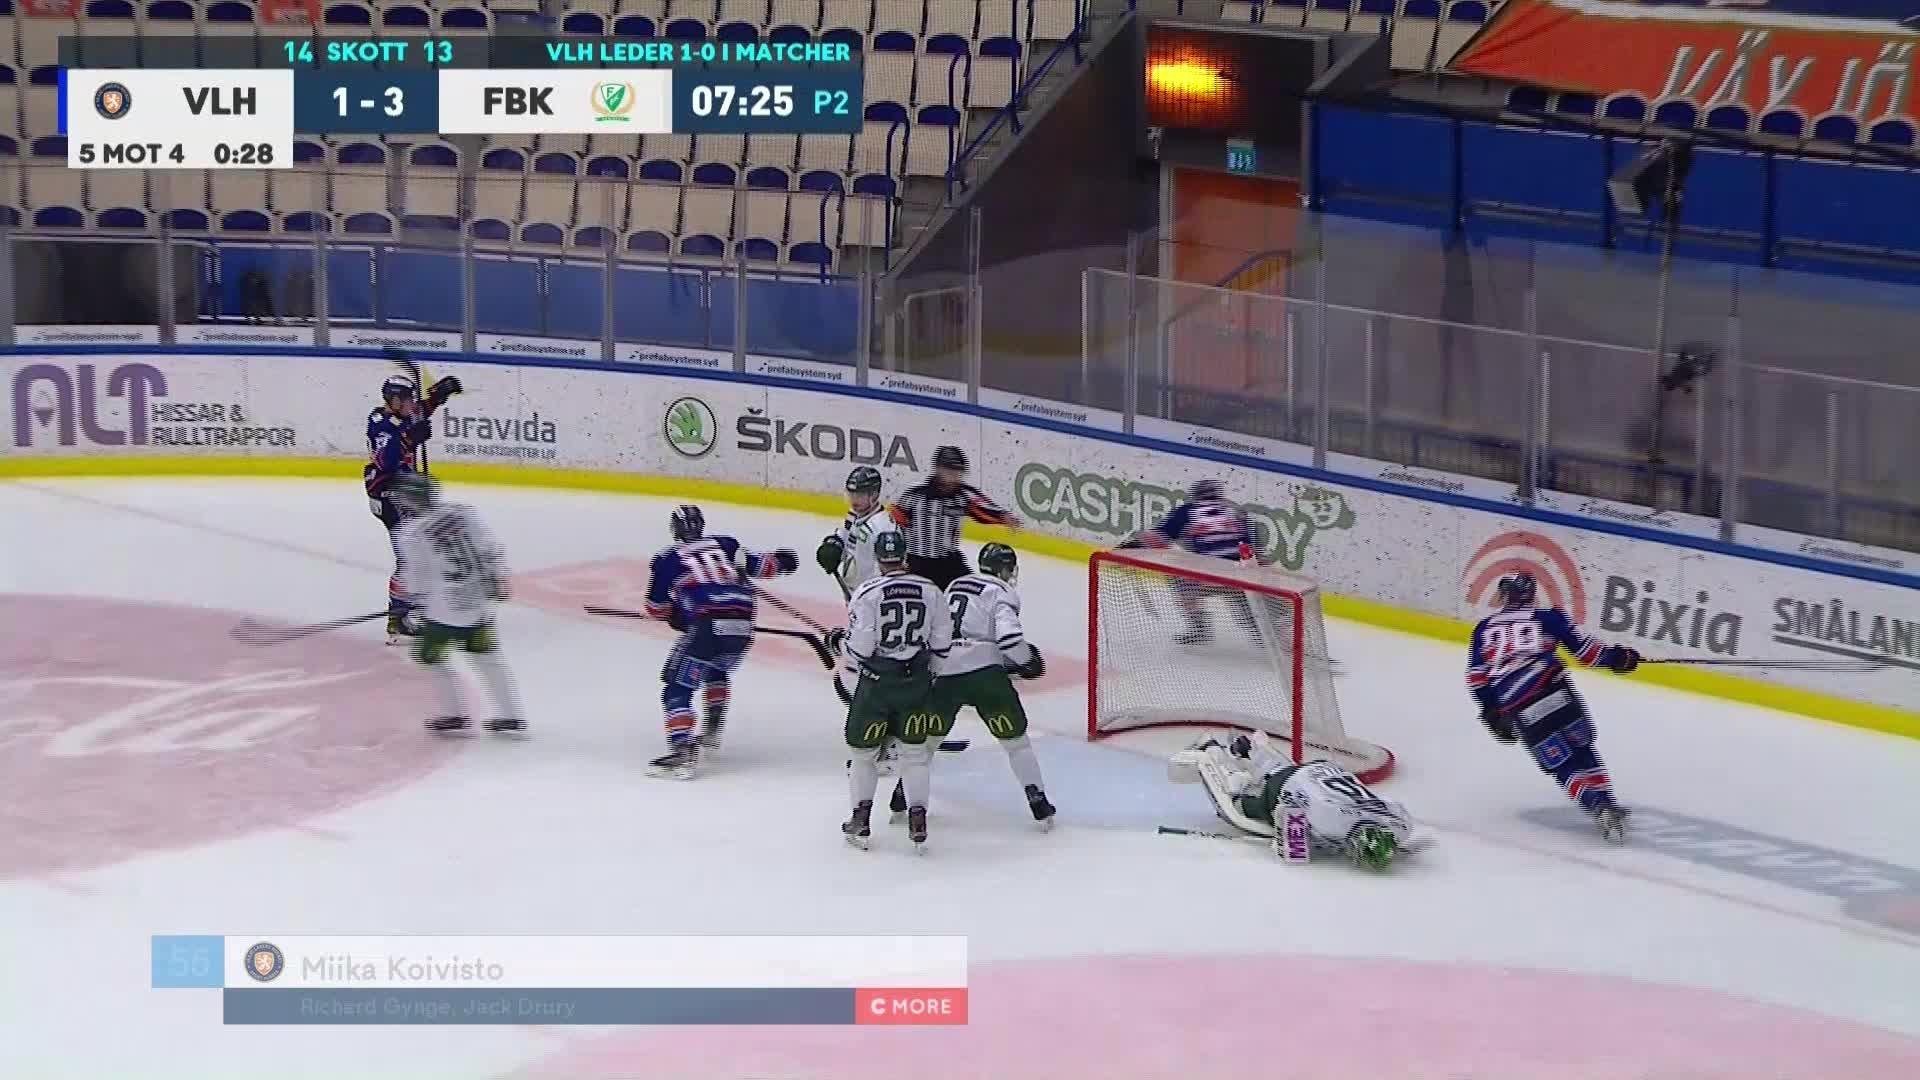 Växjö Lakers - Färjestad BK 2-3